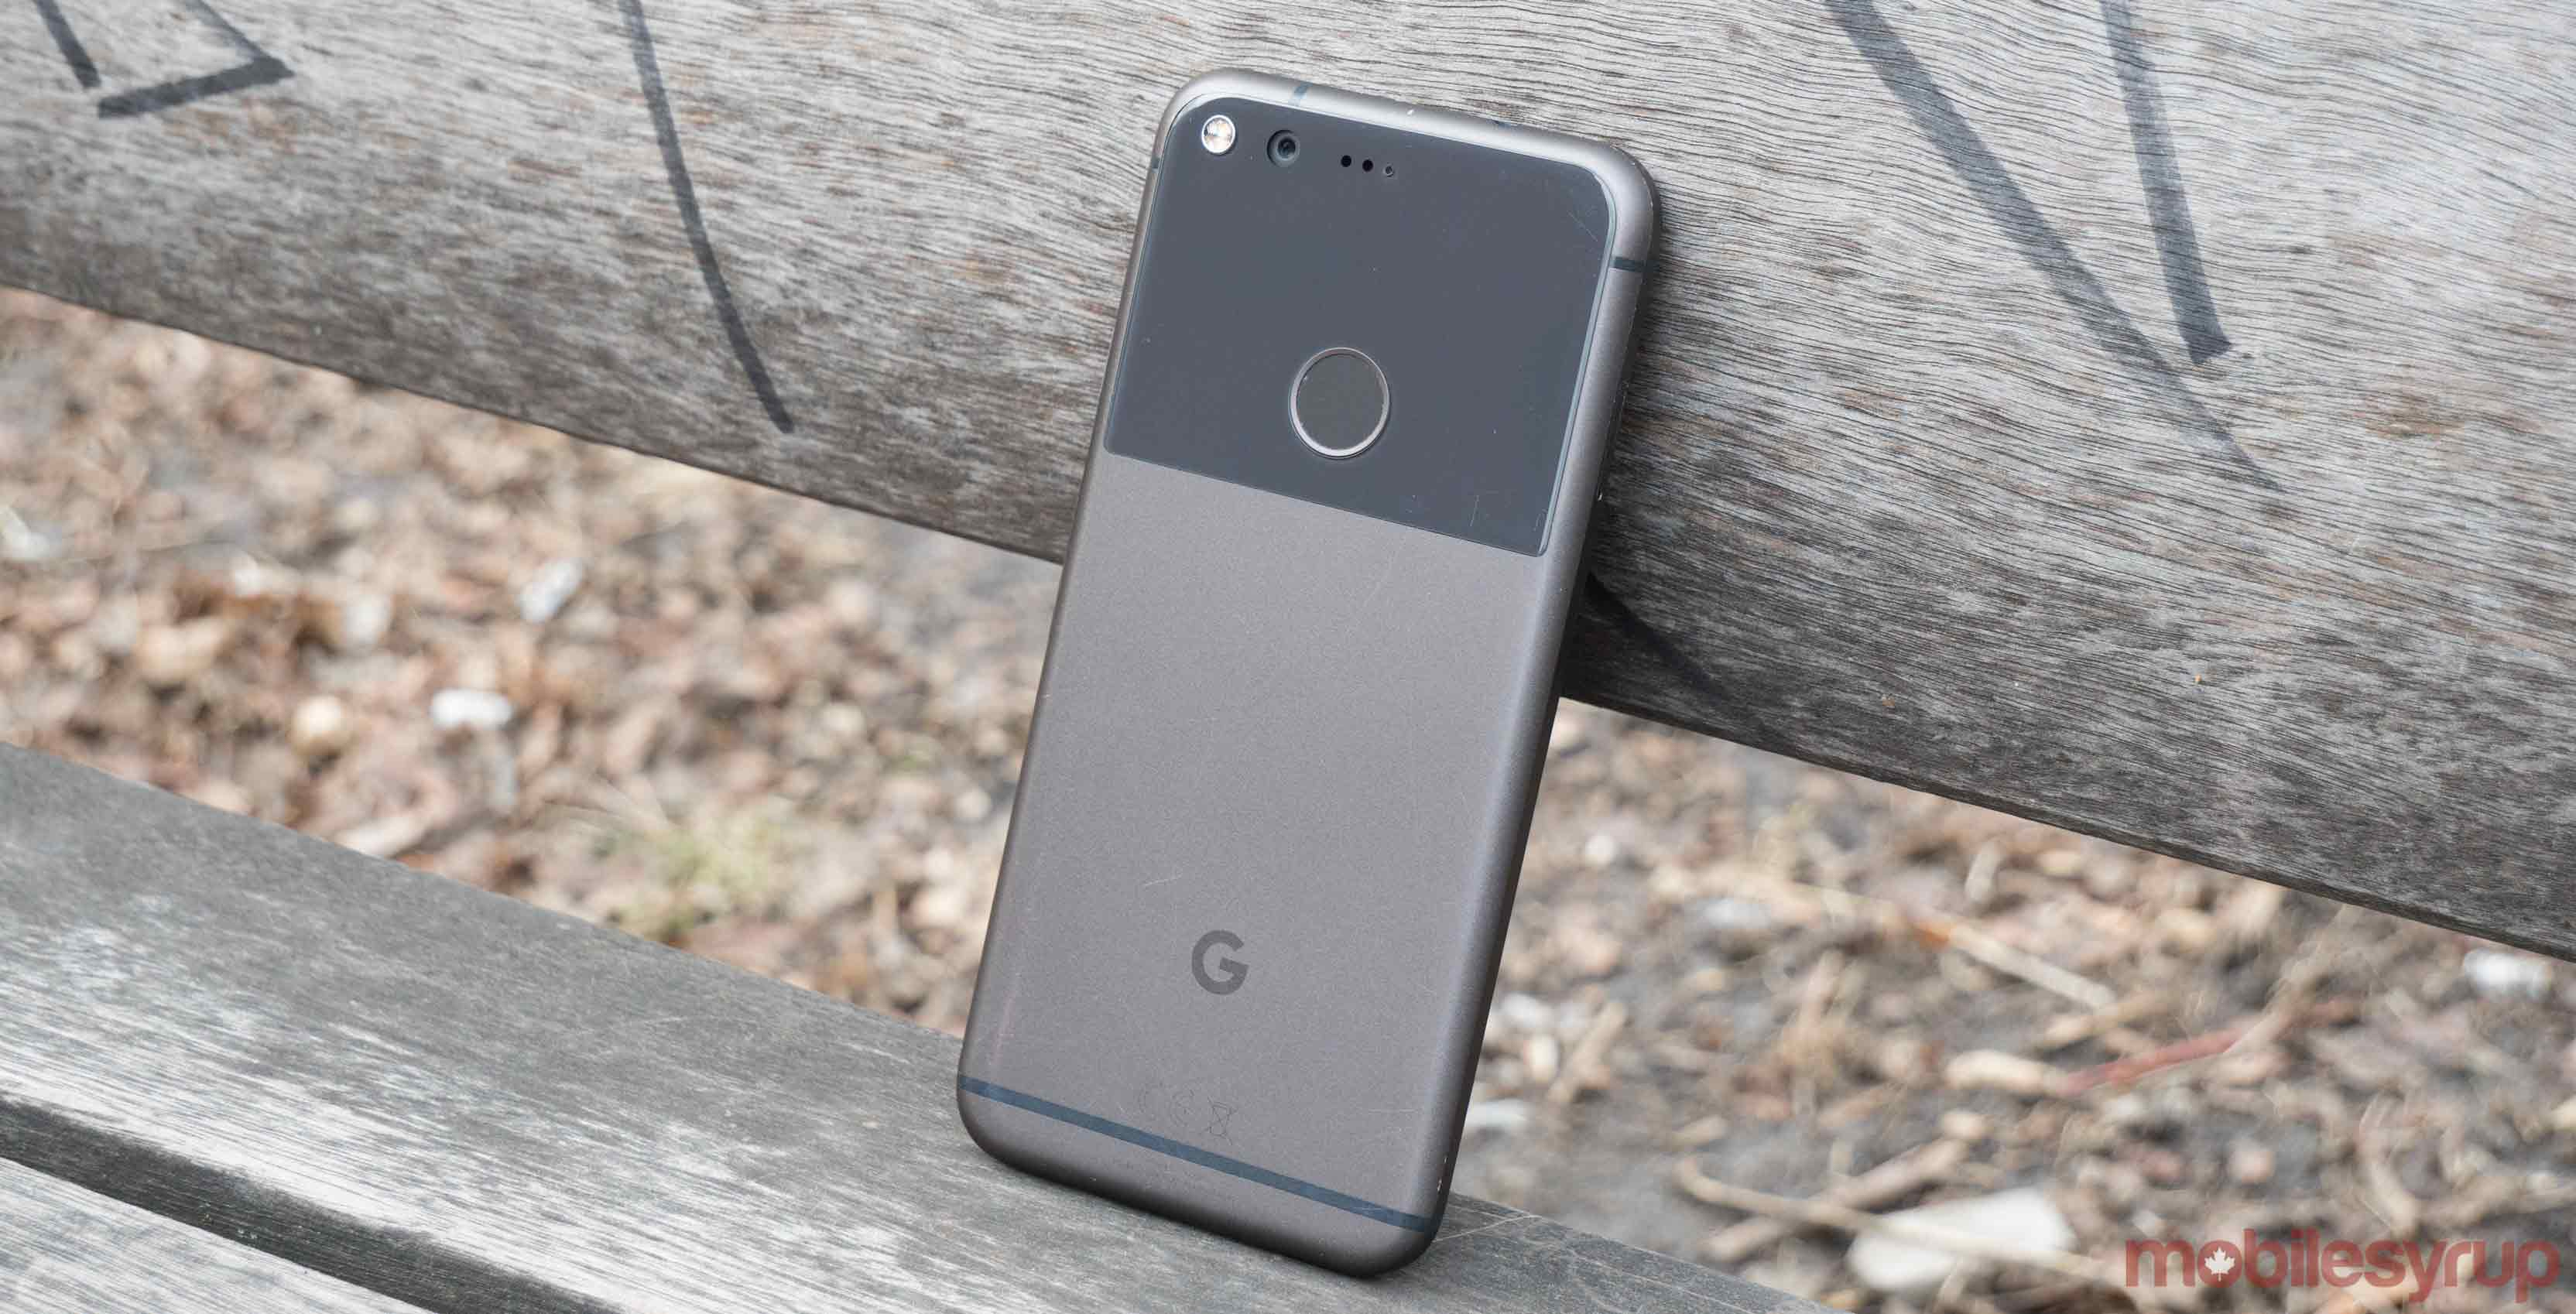 Google Pixel android 7.1.2 nougat